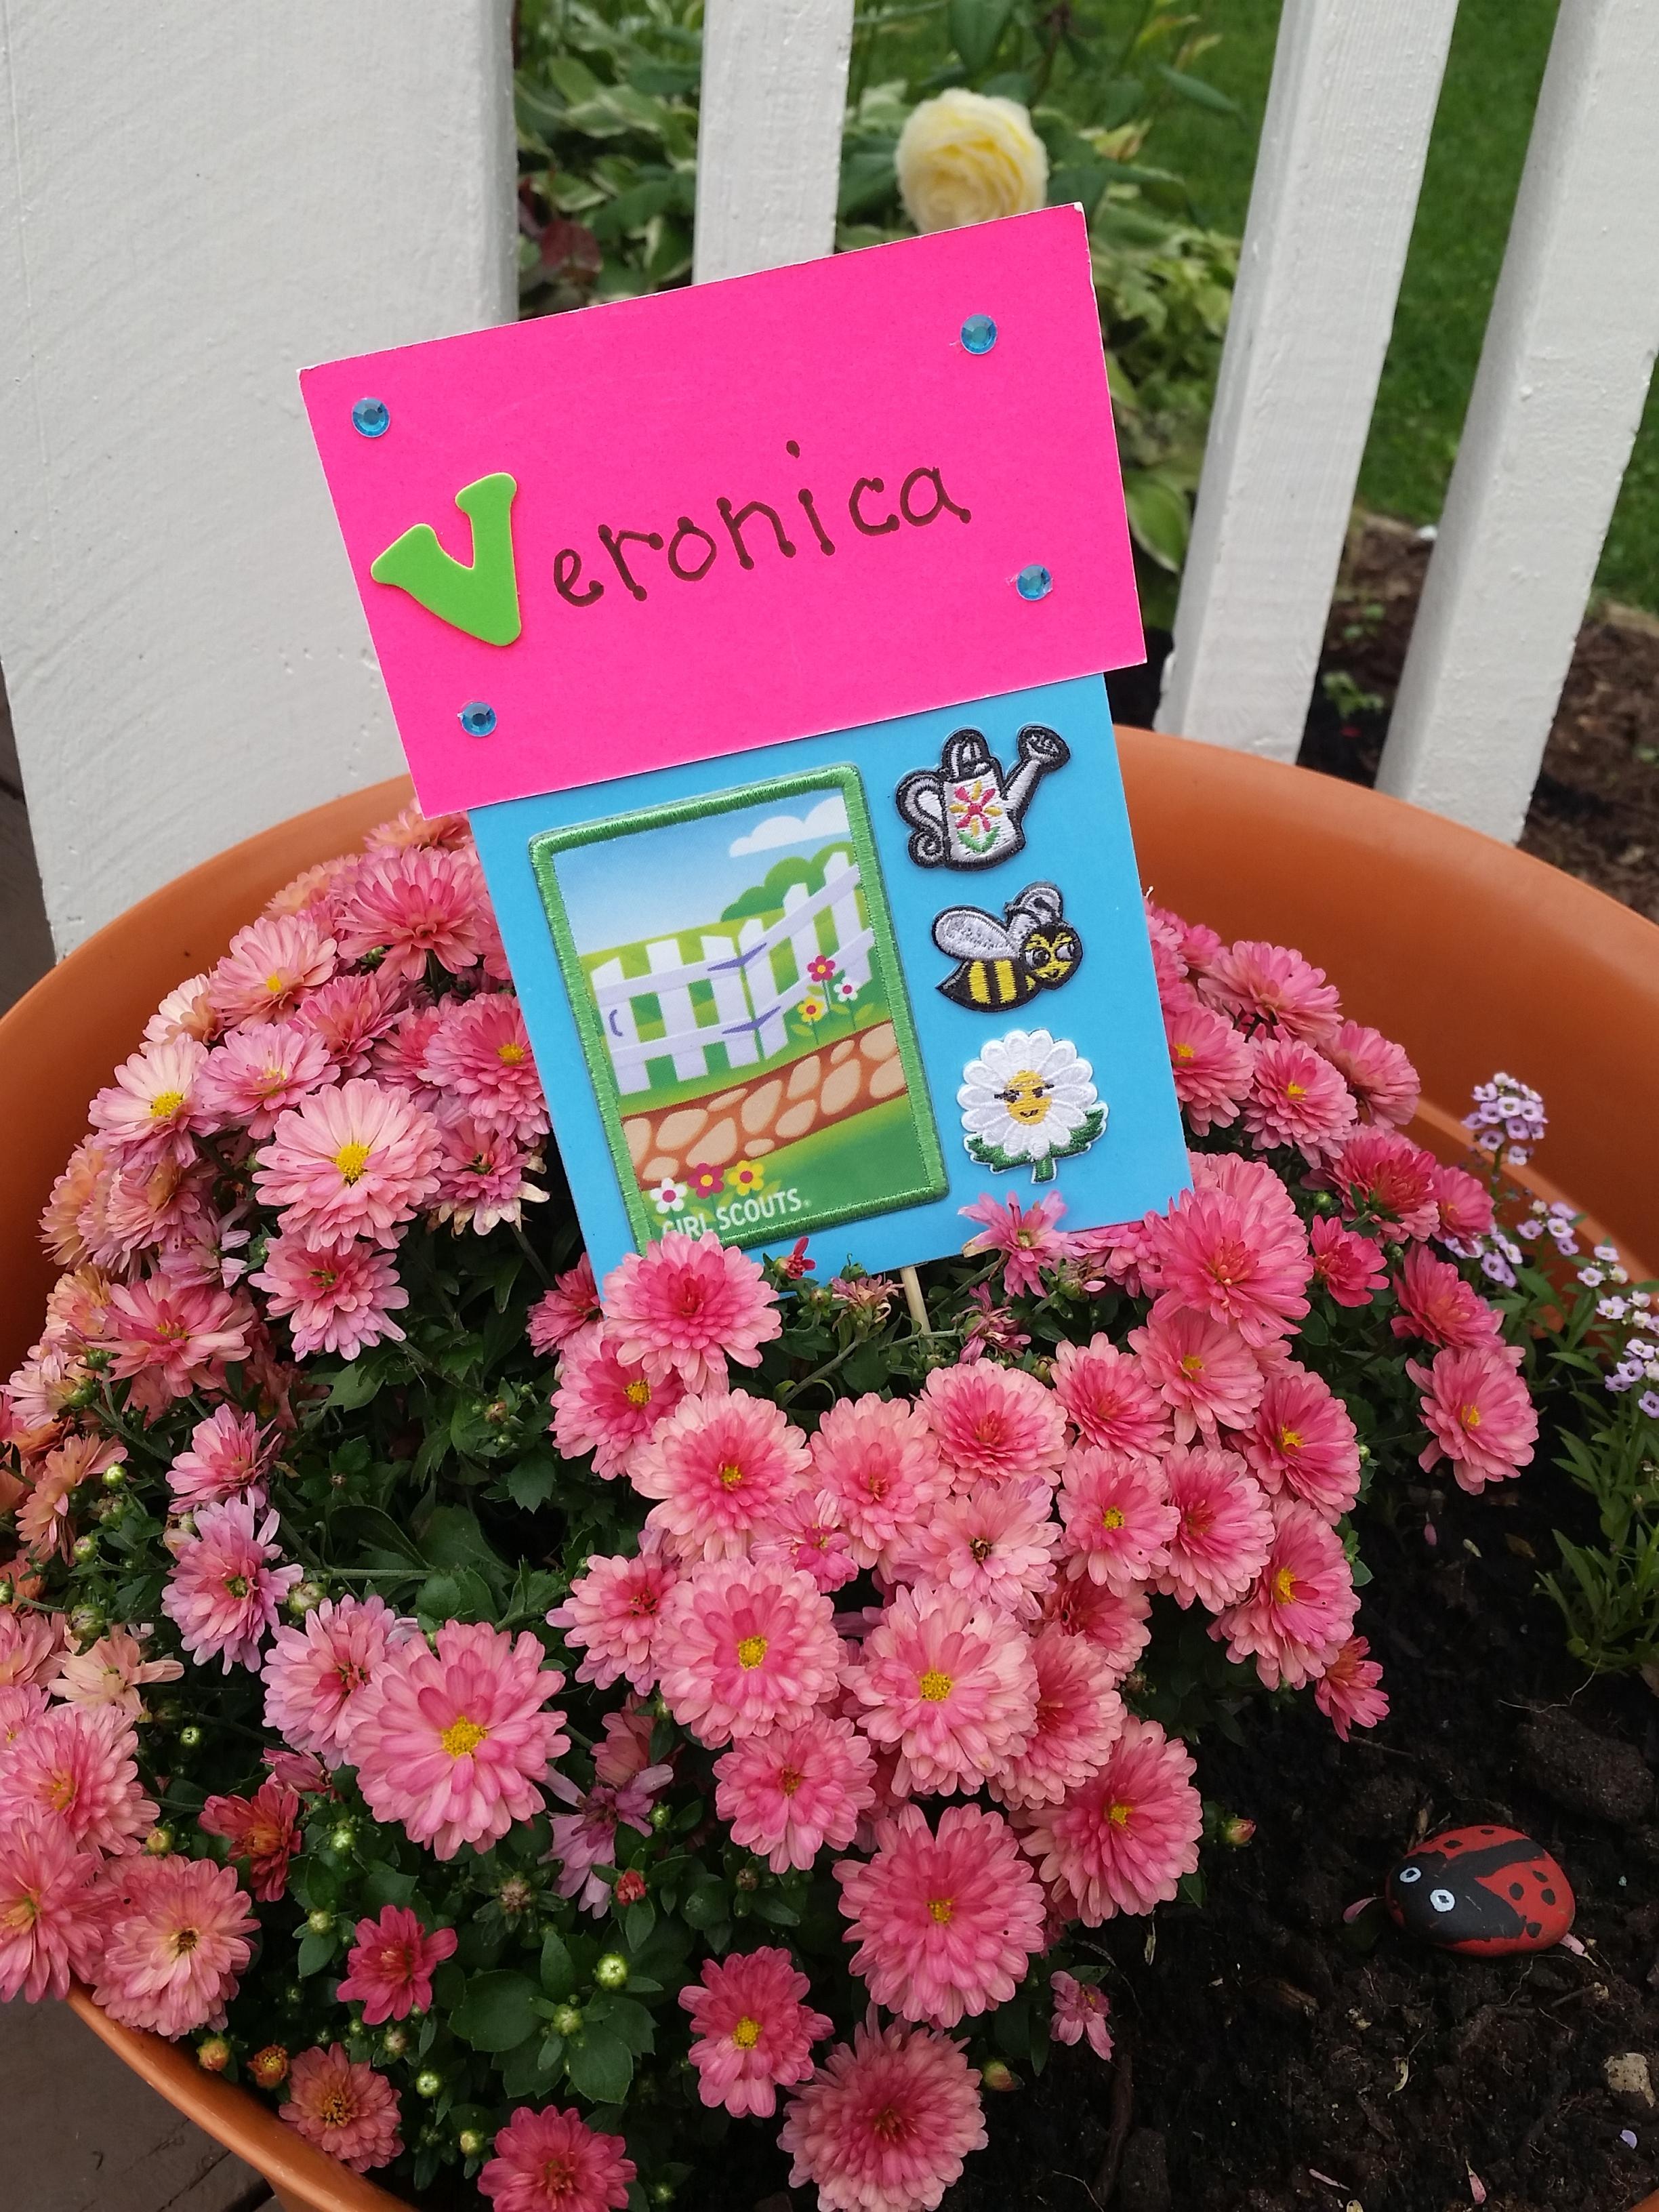 Daisy flower garden journey patches izmirmasajfo